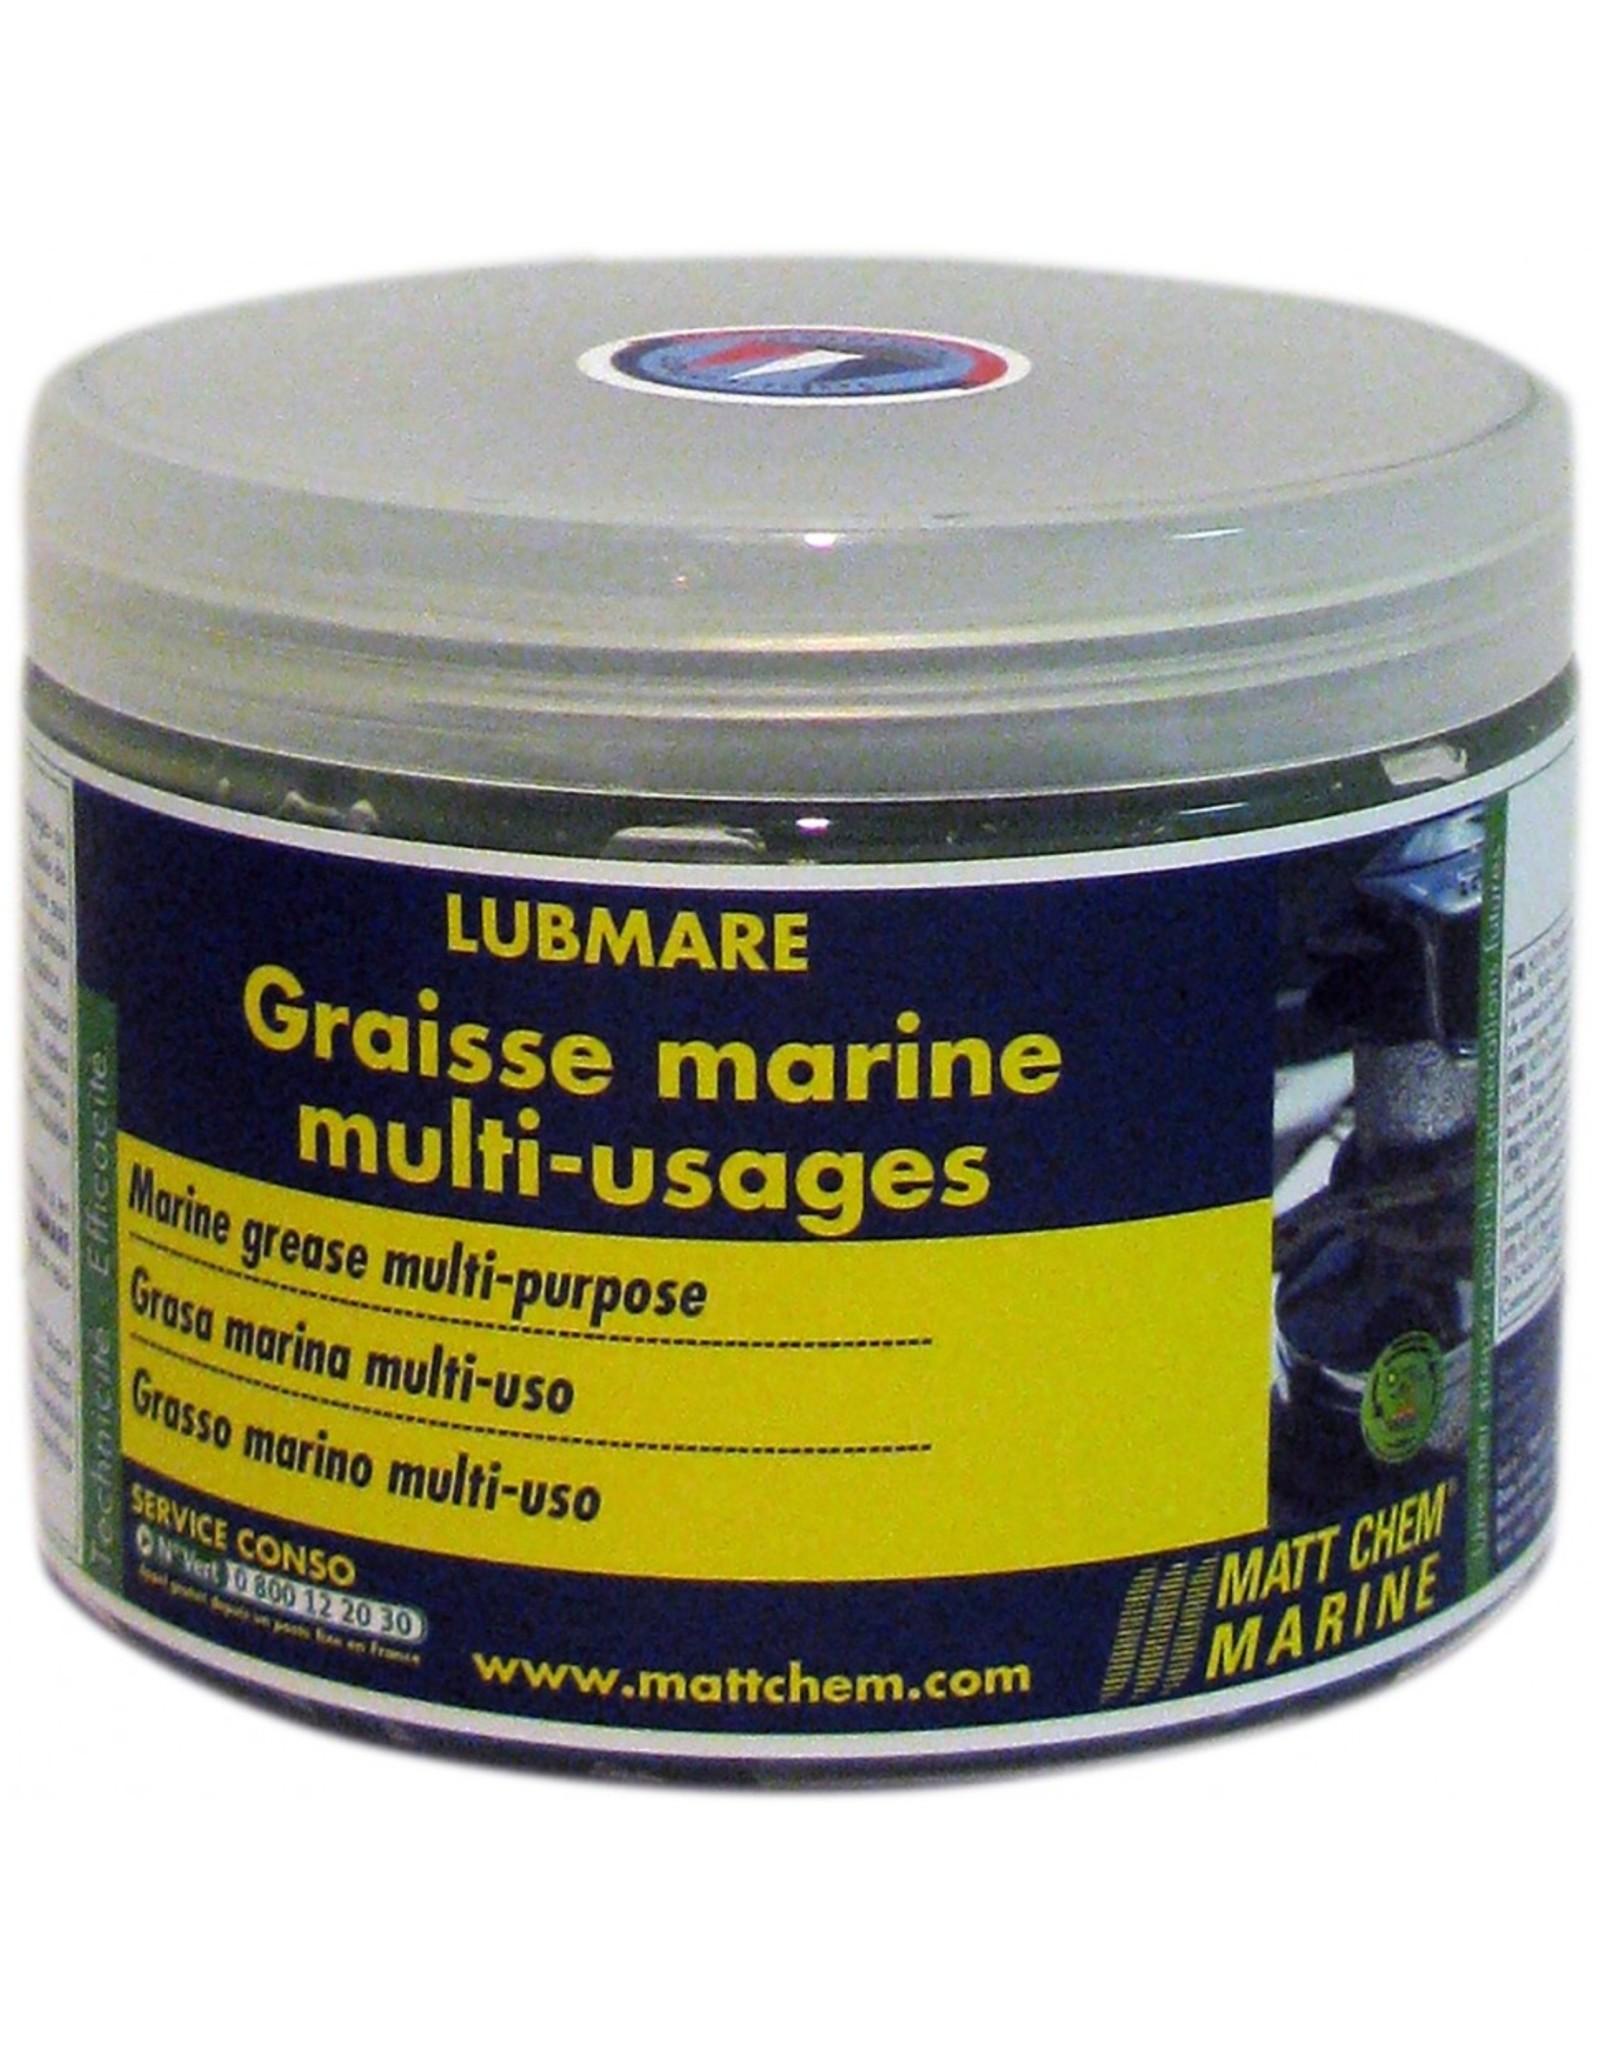 Matt Chem Marine Lubmare Marine Grease 0,5Kg